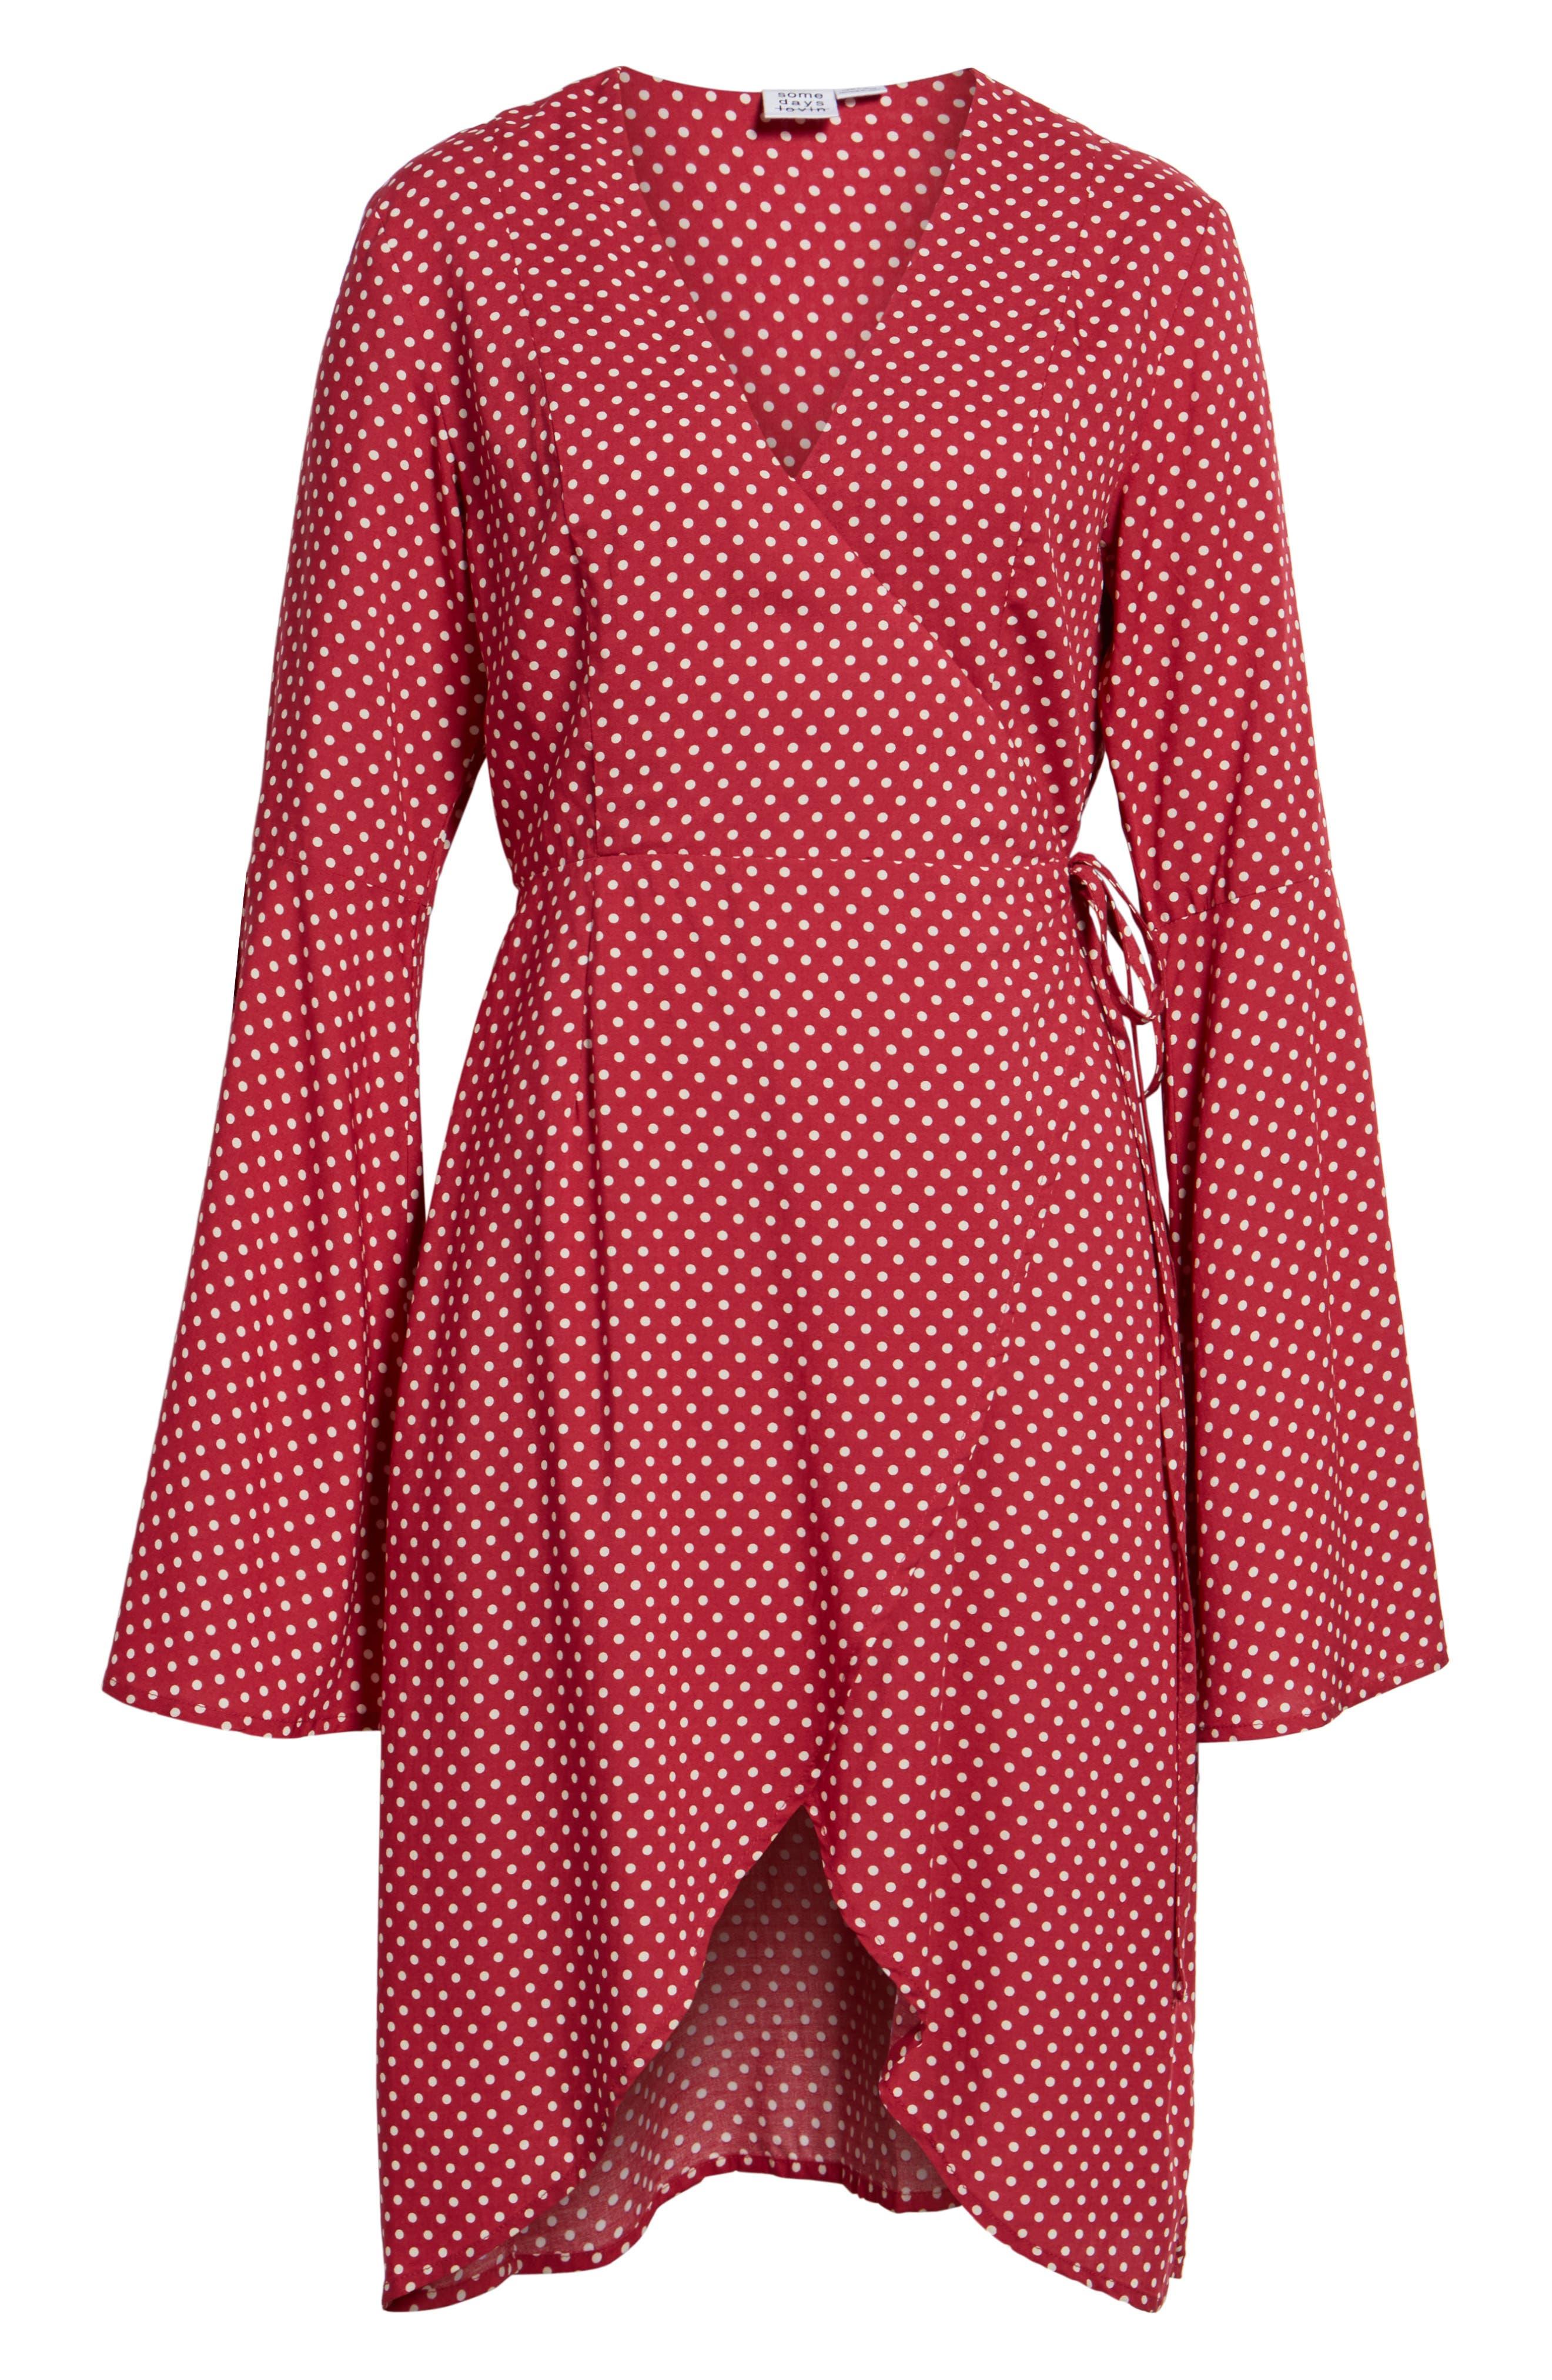 Fearless Polka Dot Wrap Dress,                             Alternate thumbnail 7, color,                             Multi Red